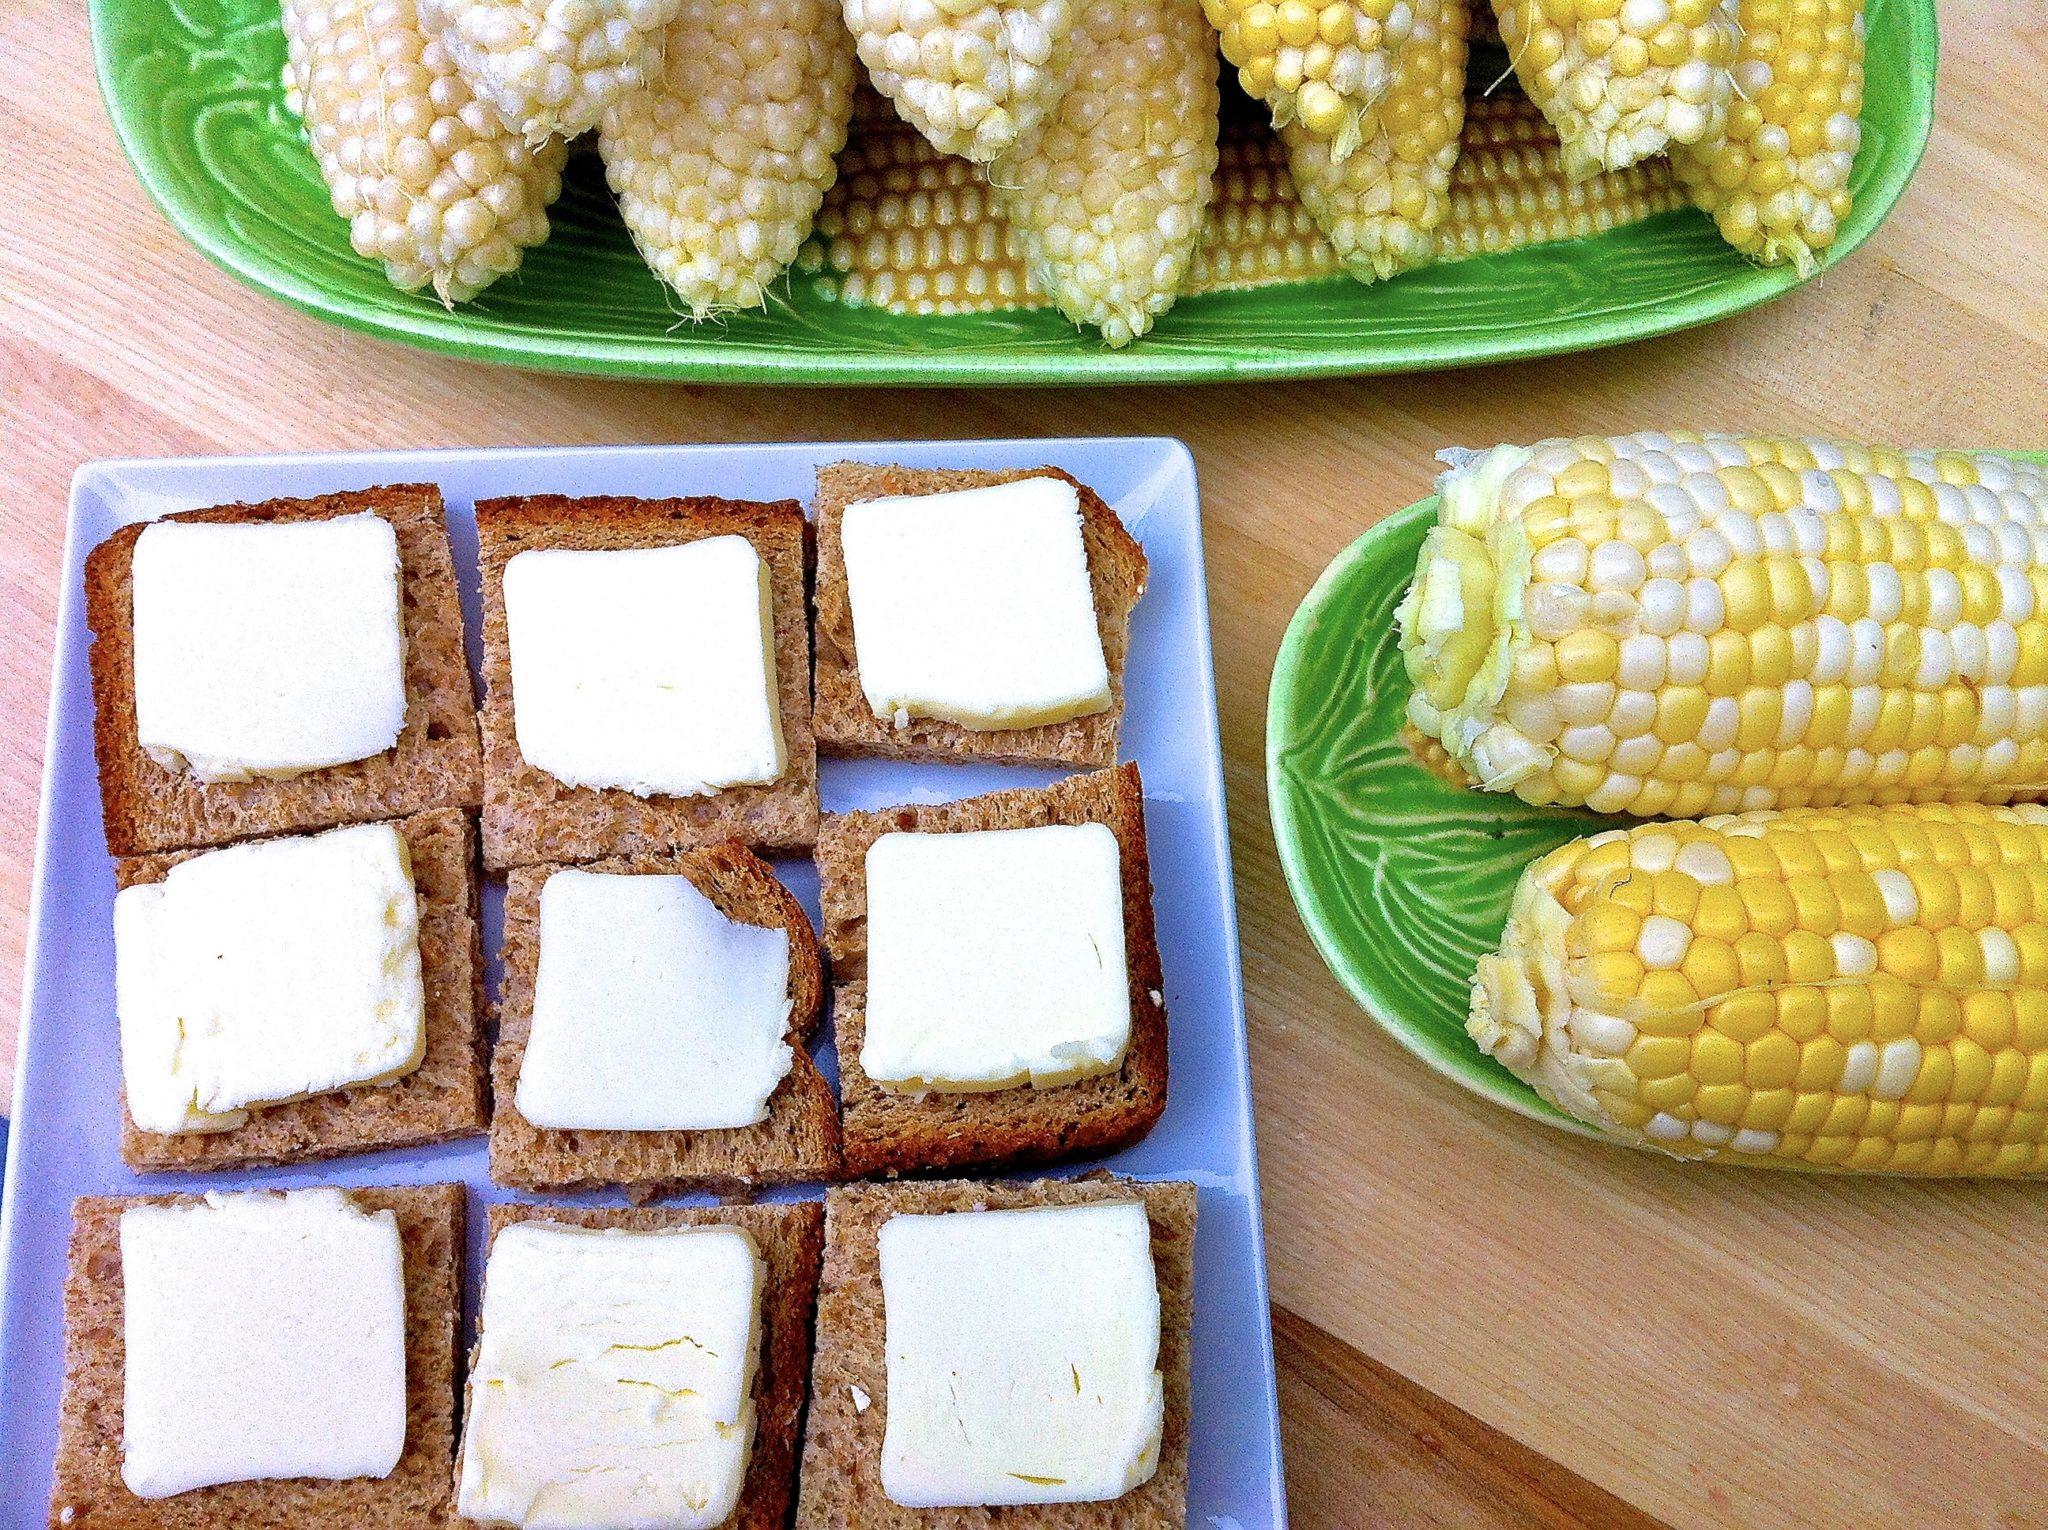 Best-ever corn buttering trick